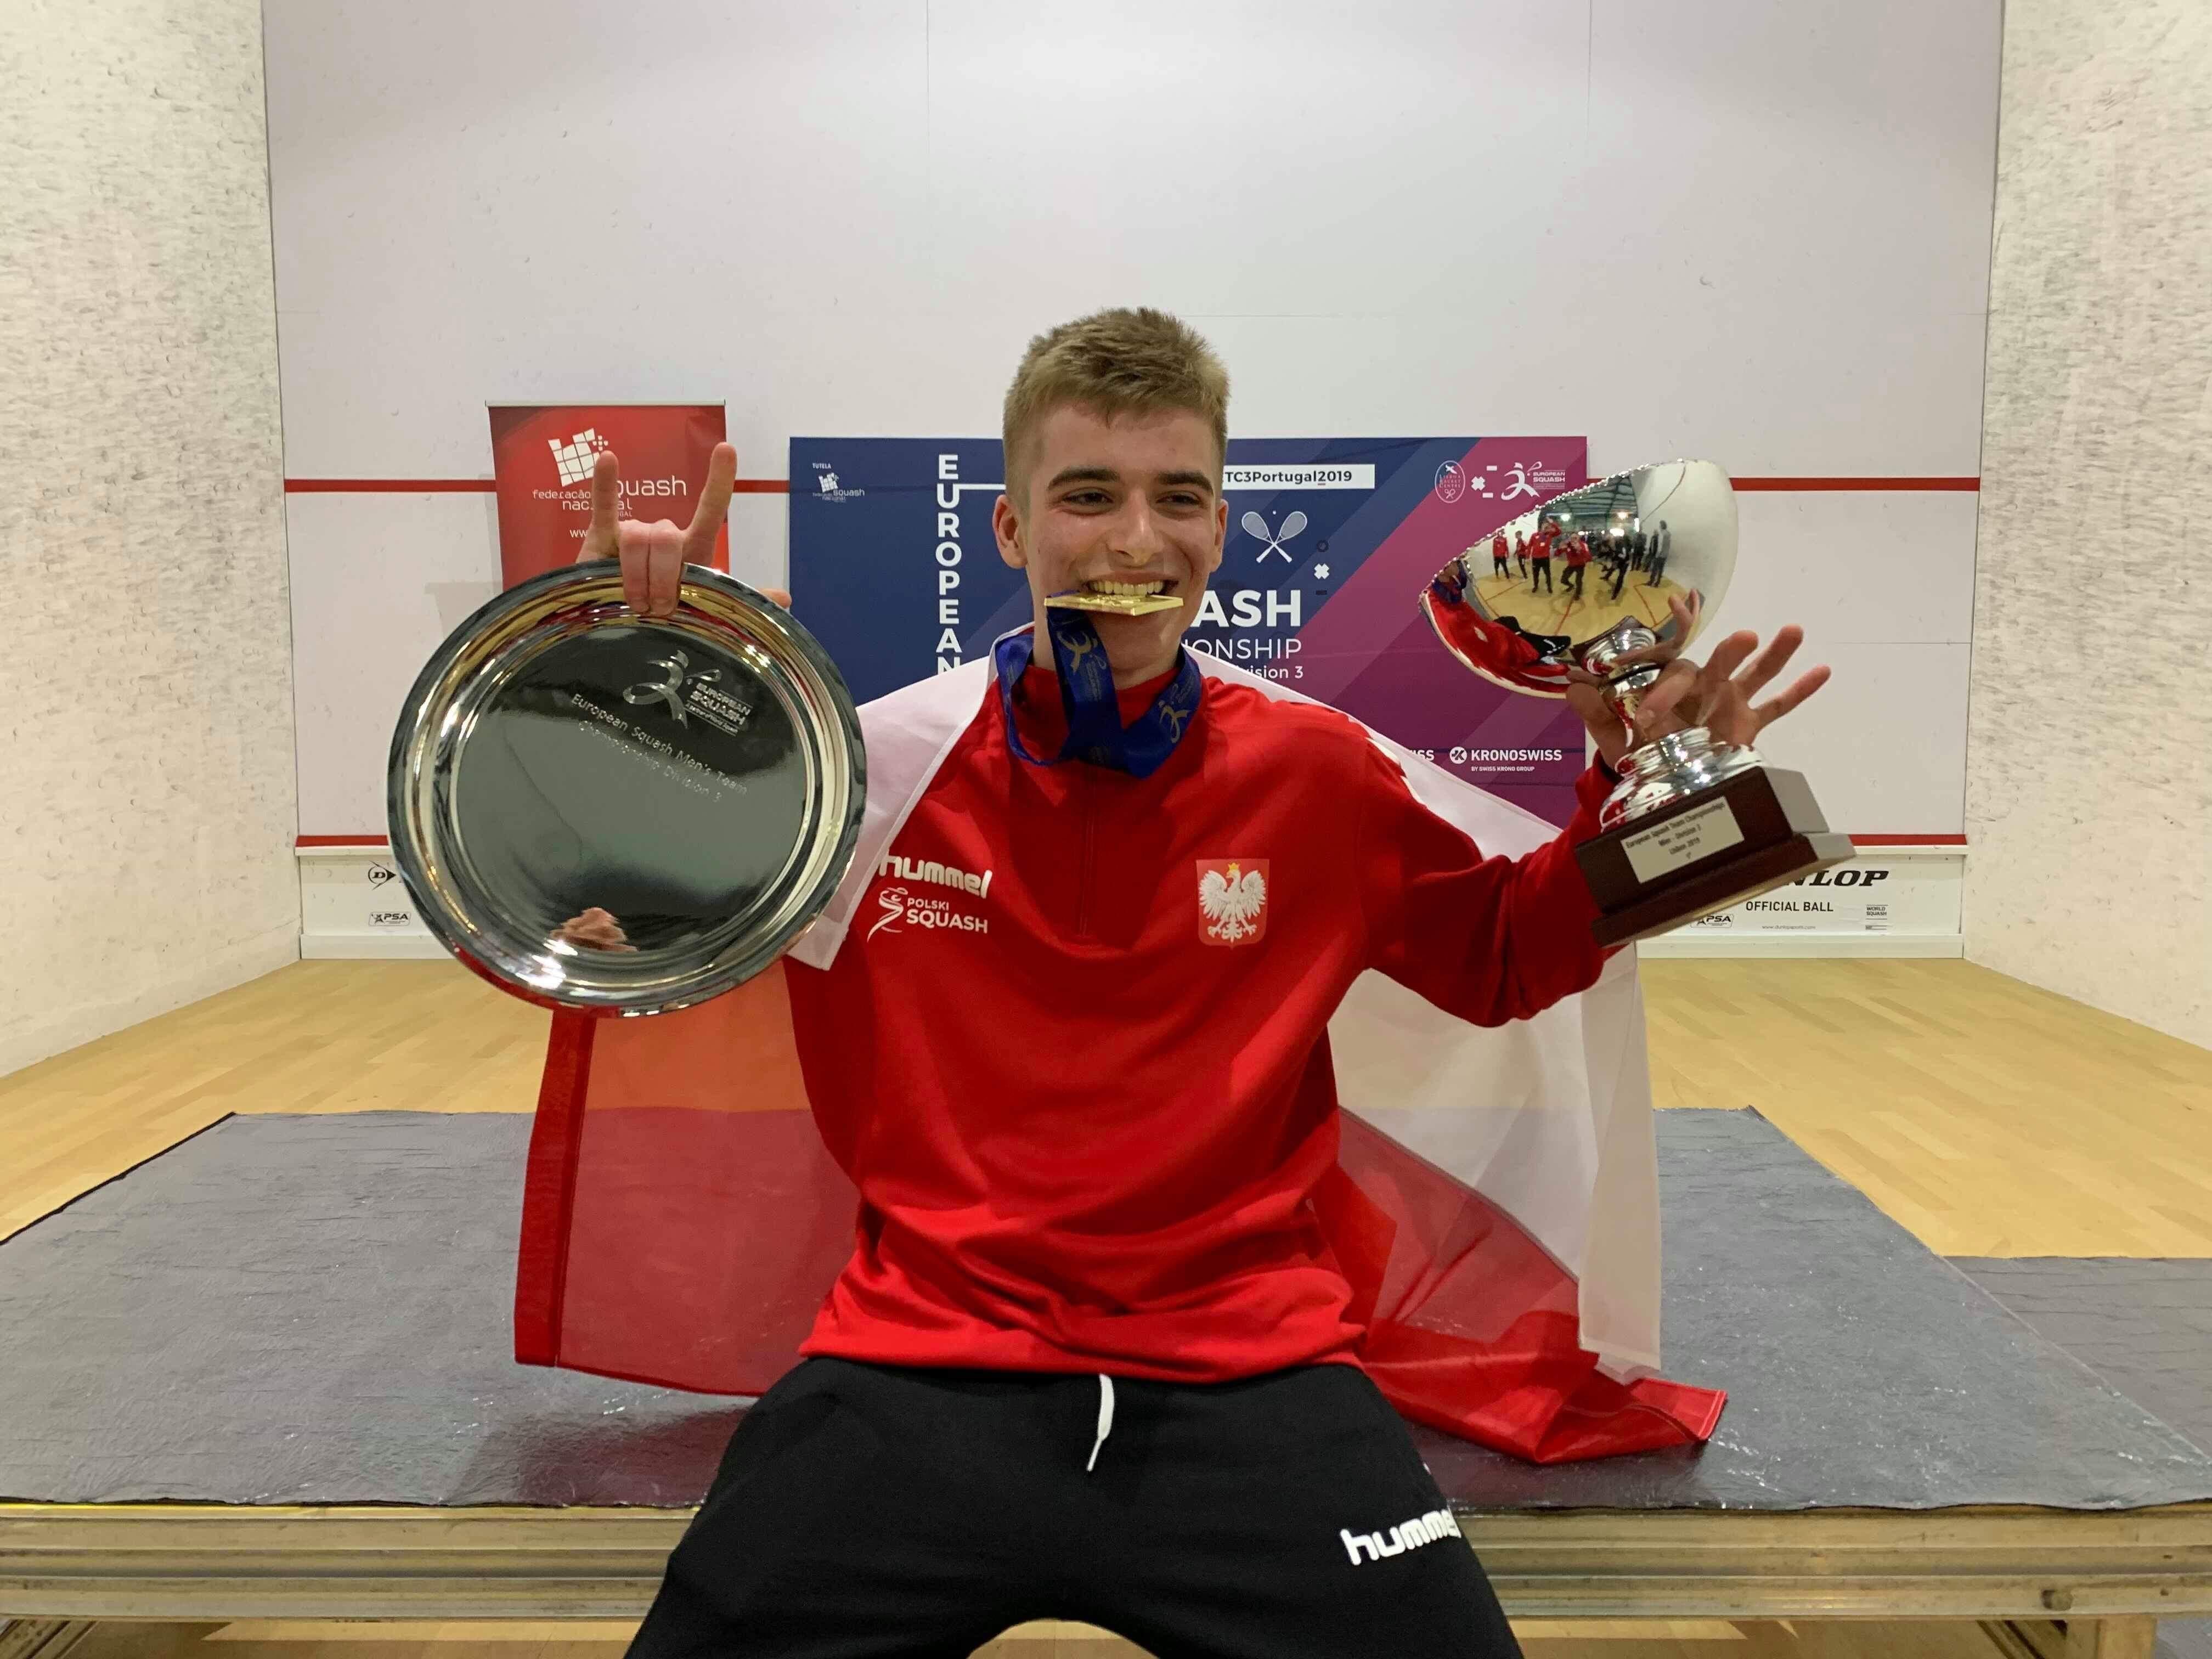 Piotr Hemmerling squash